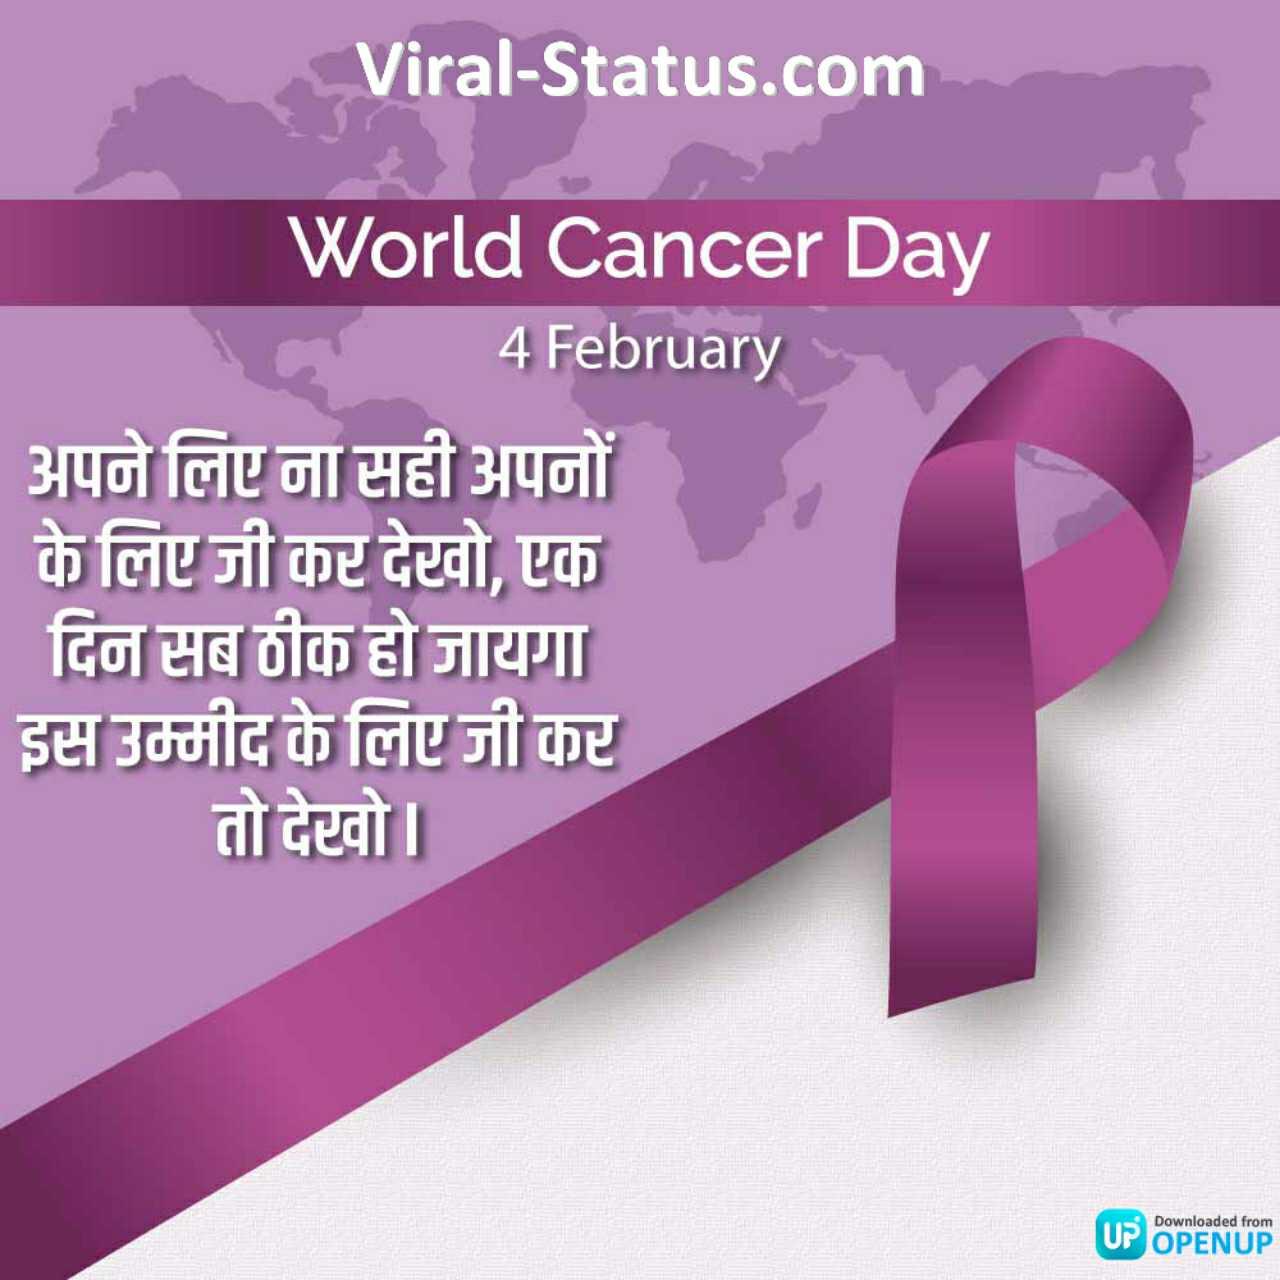 वर्ल्ड कैंसर डे